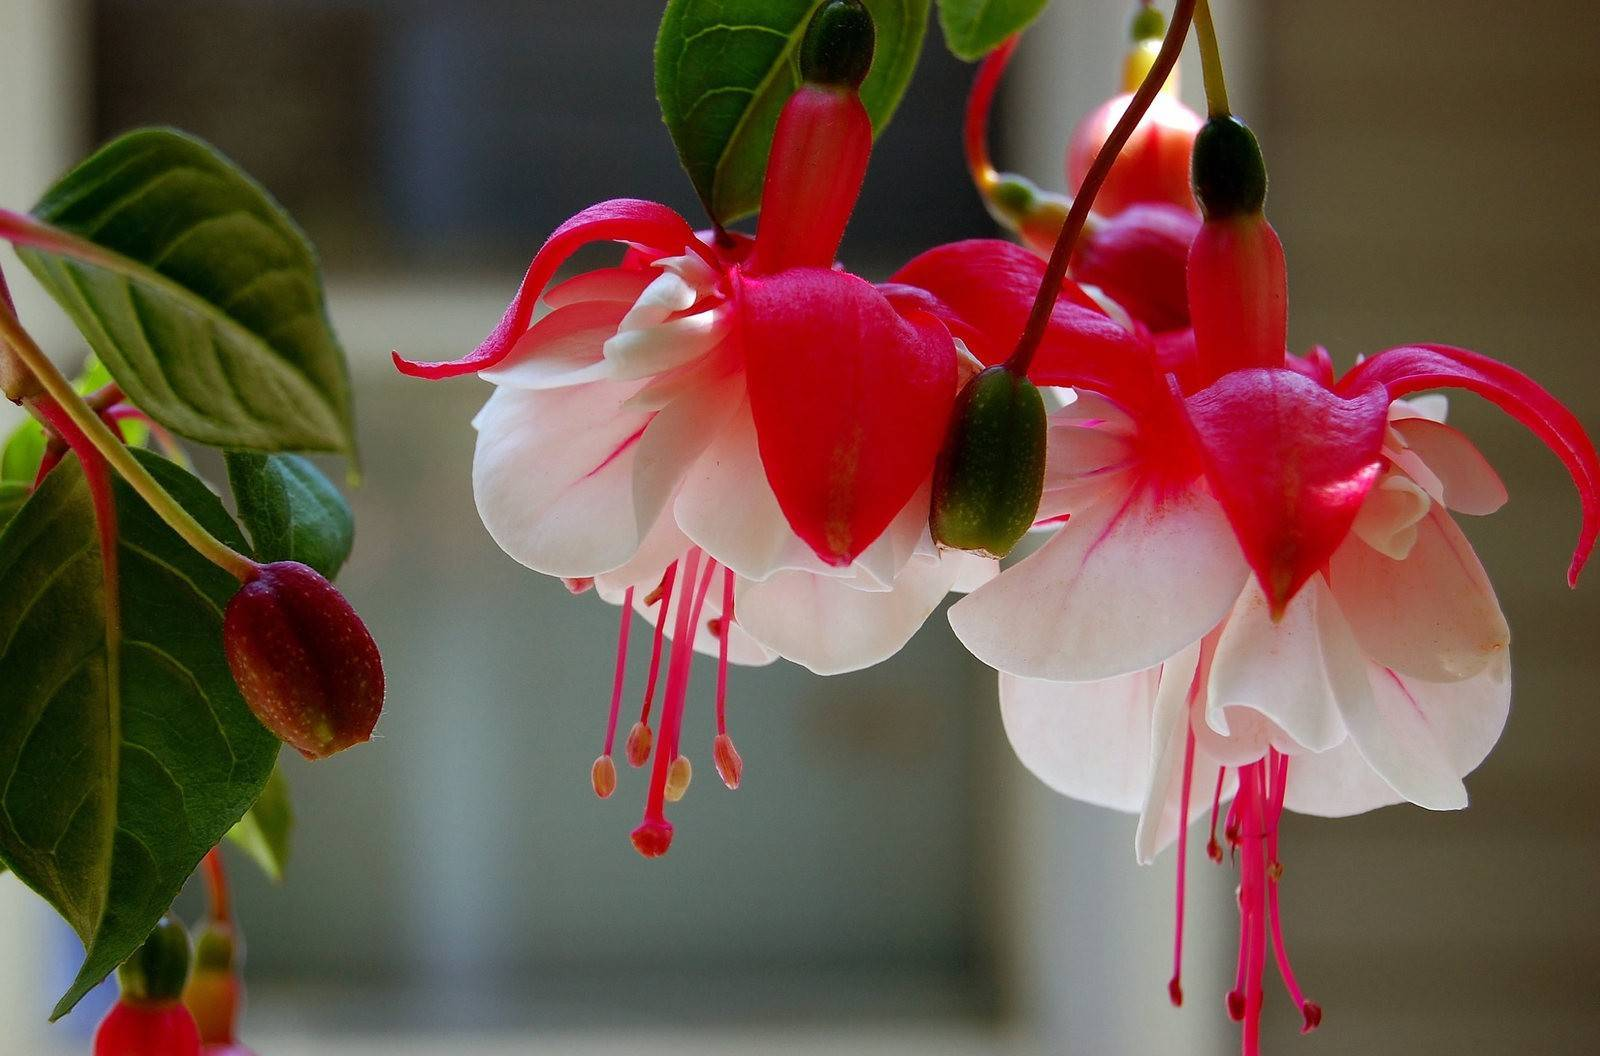 Семена фуксии: как посадить фуксию семенами в домашних условиях